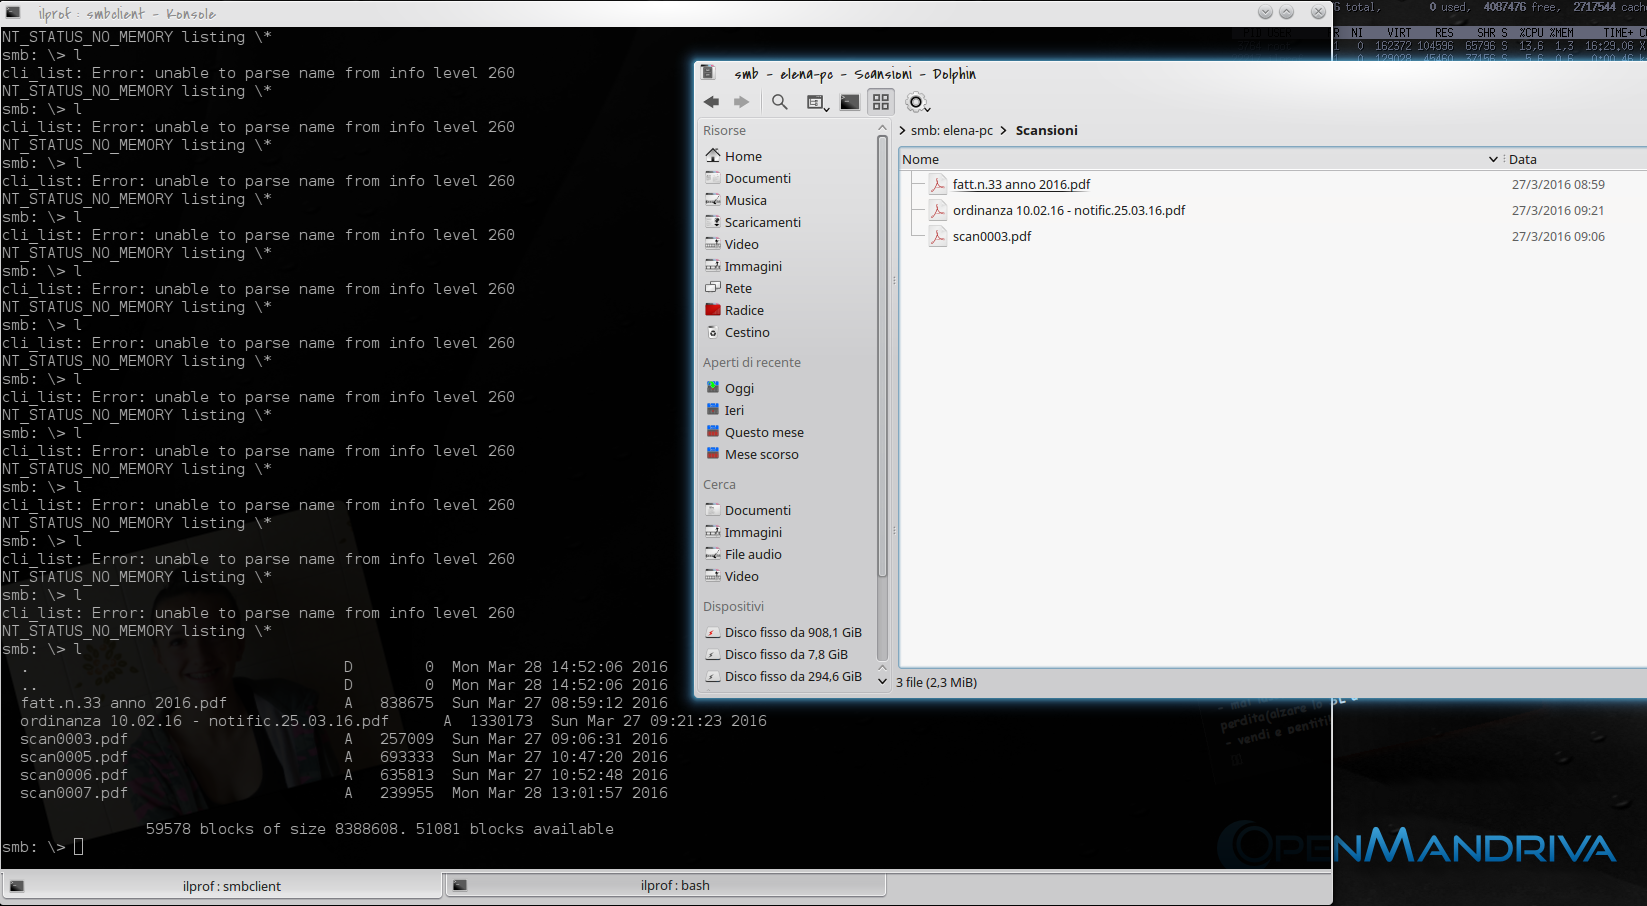 Samba and windows 10 shared folder strange behaviour - Support - OMA